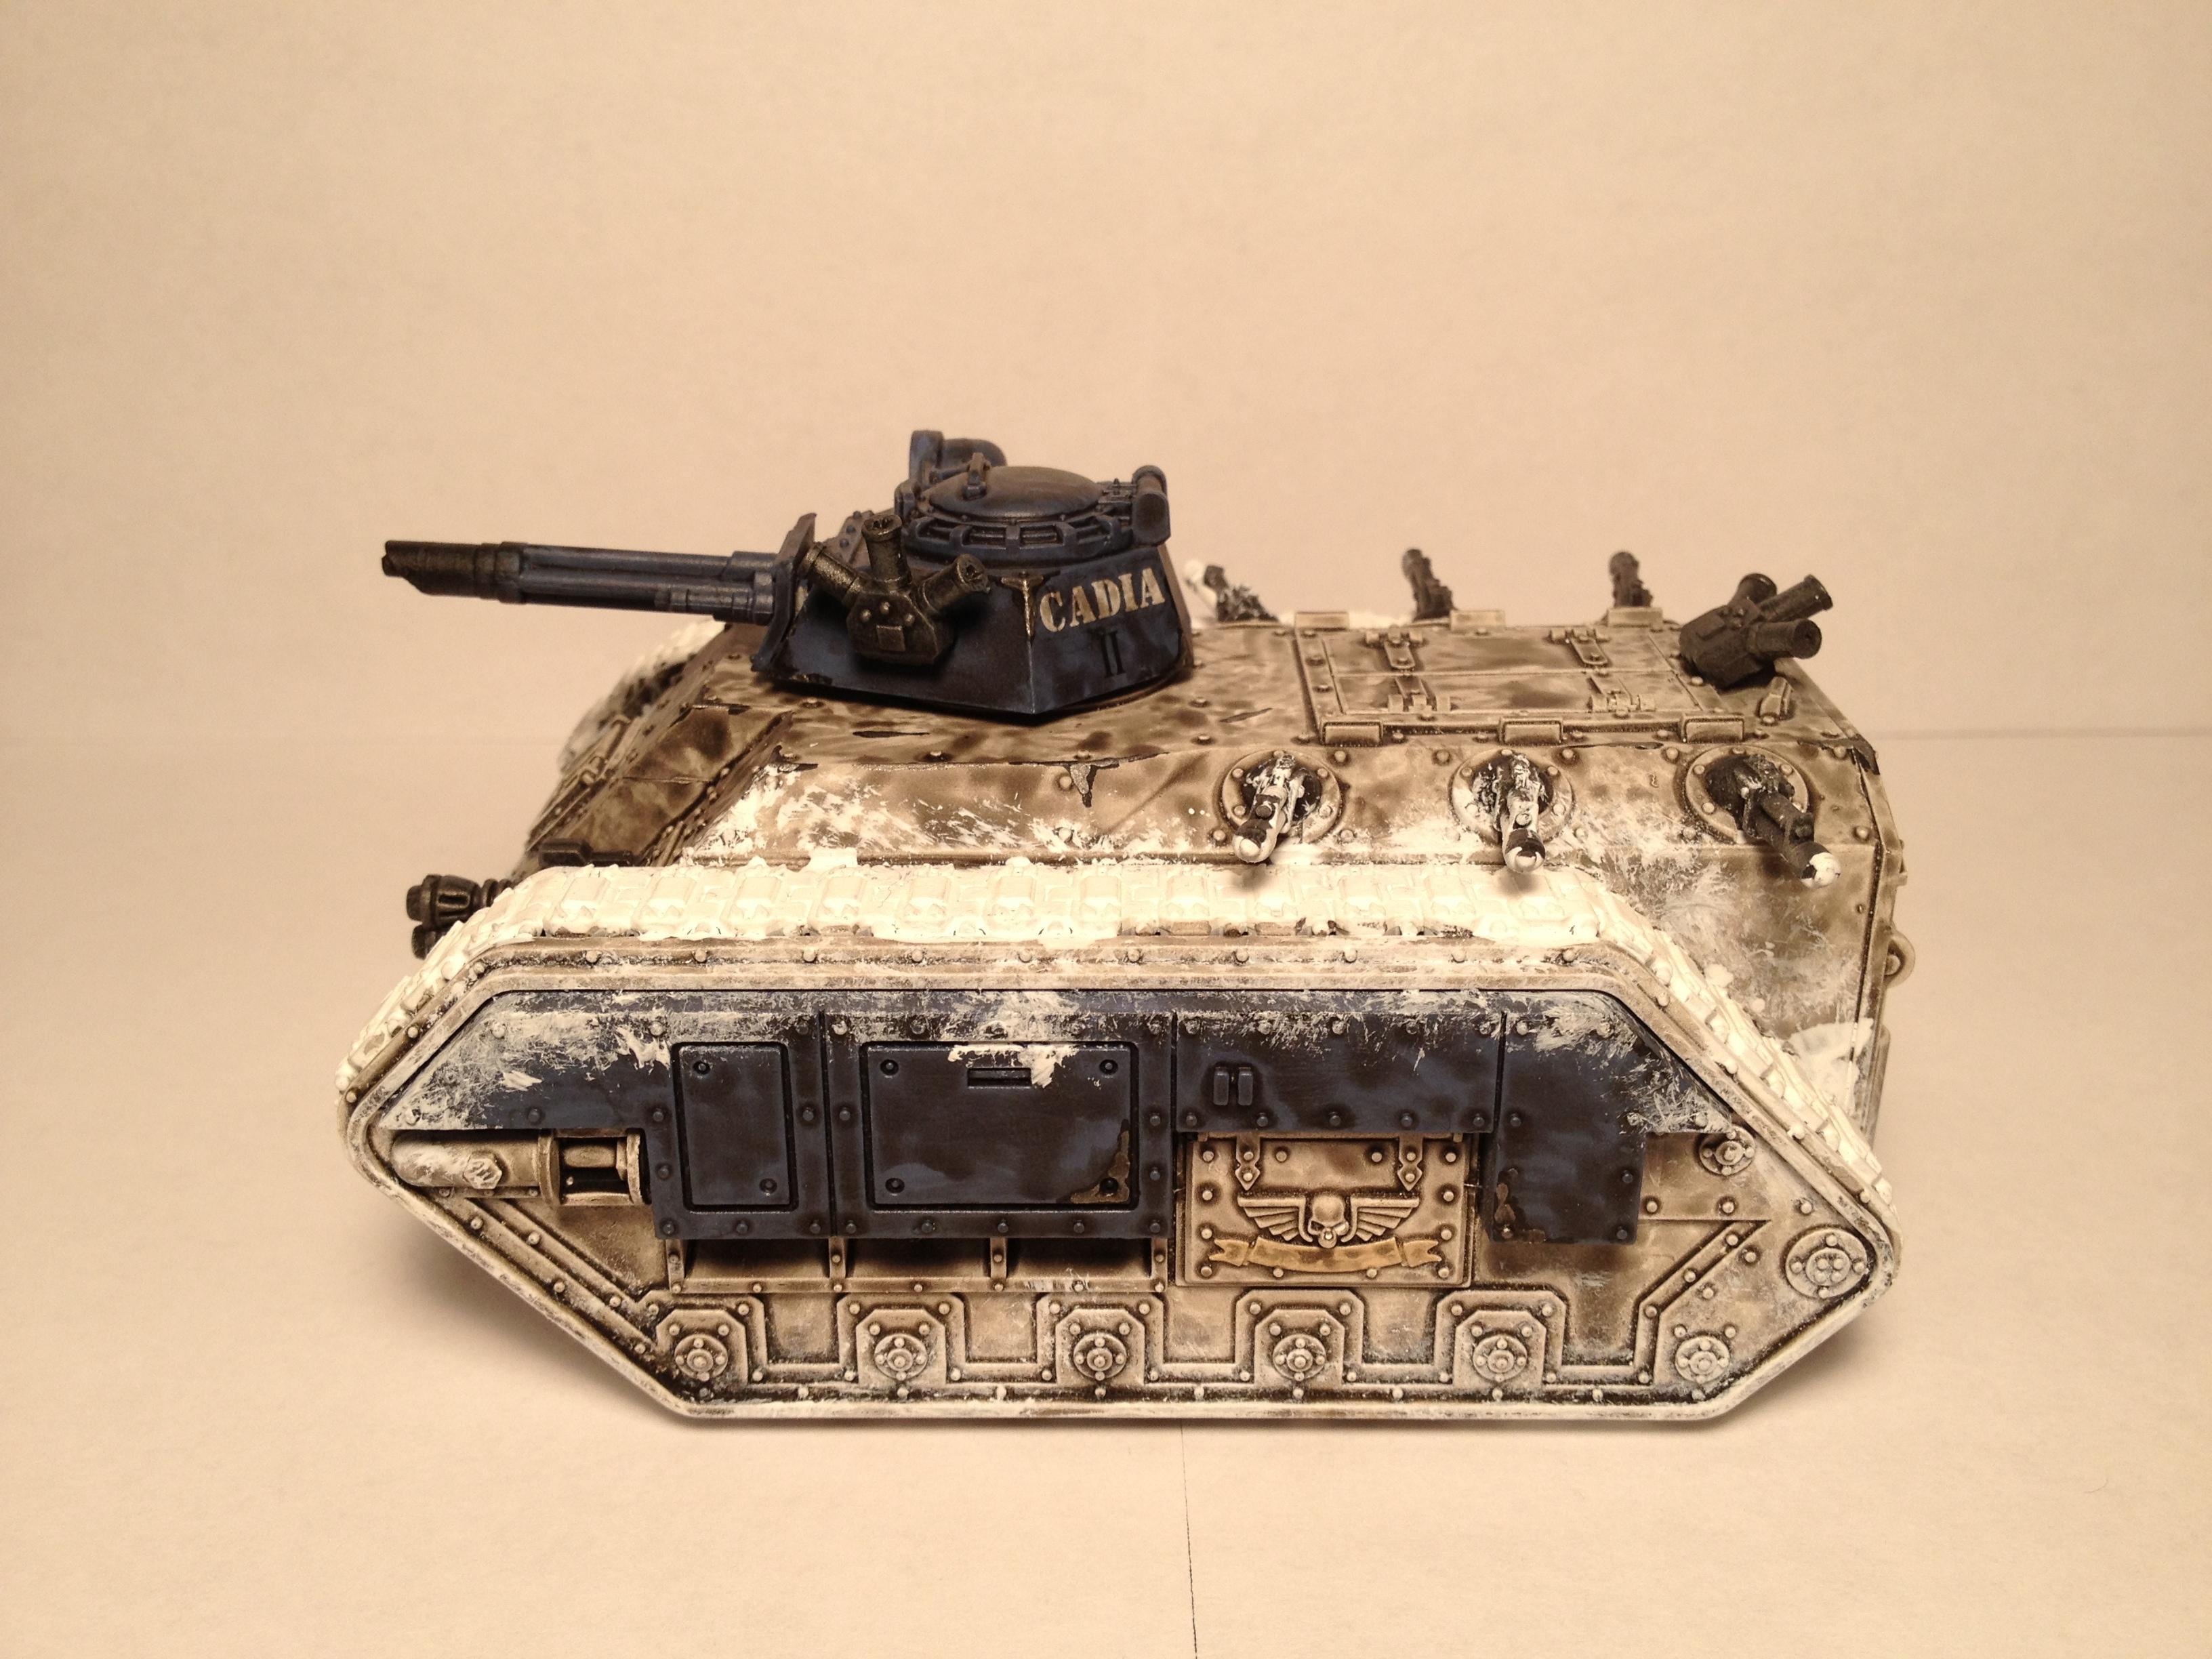 Imperial Guard, Imperial Guard Chimera